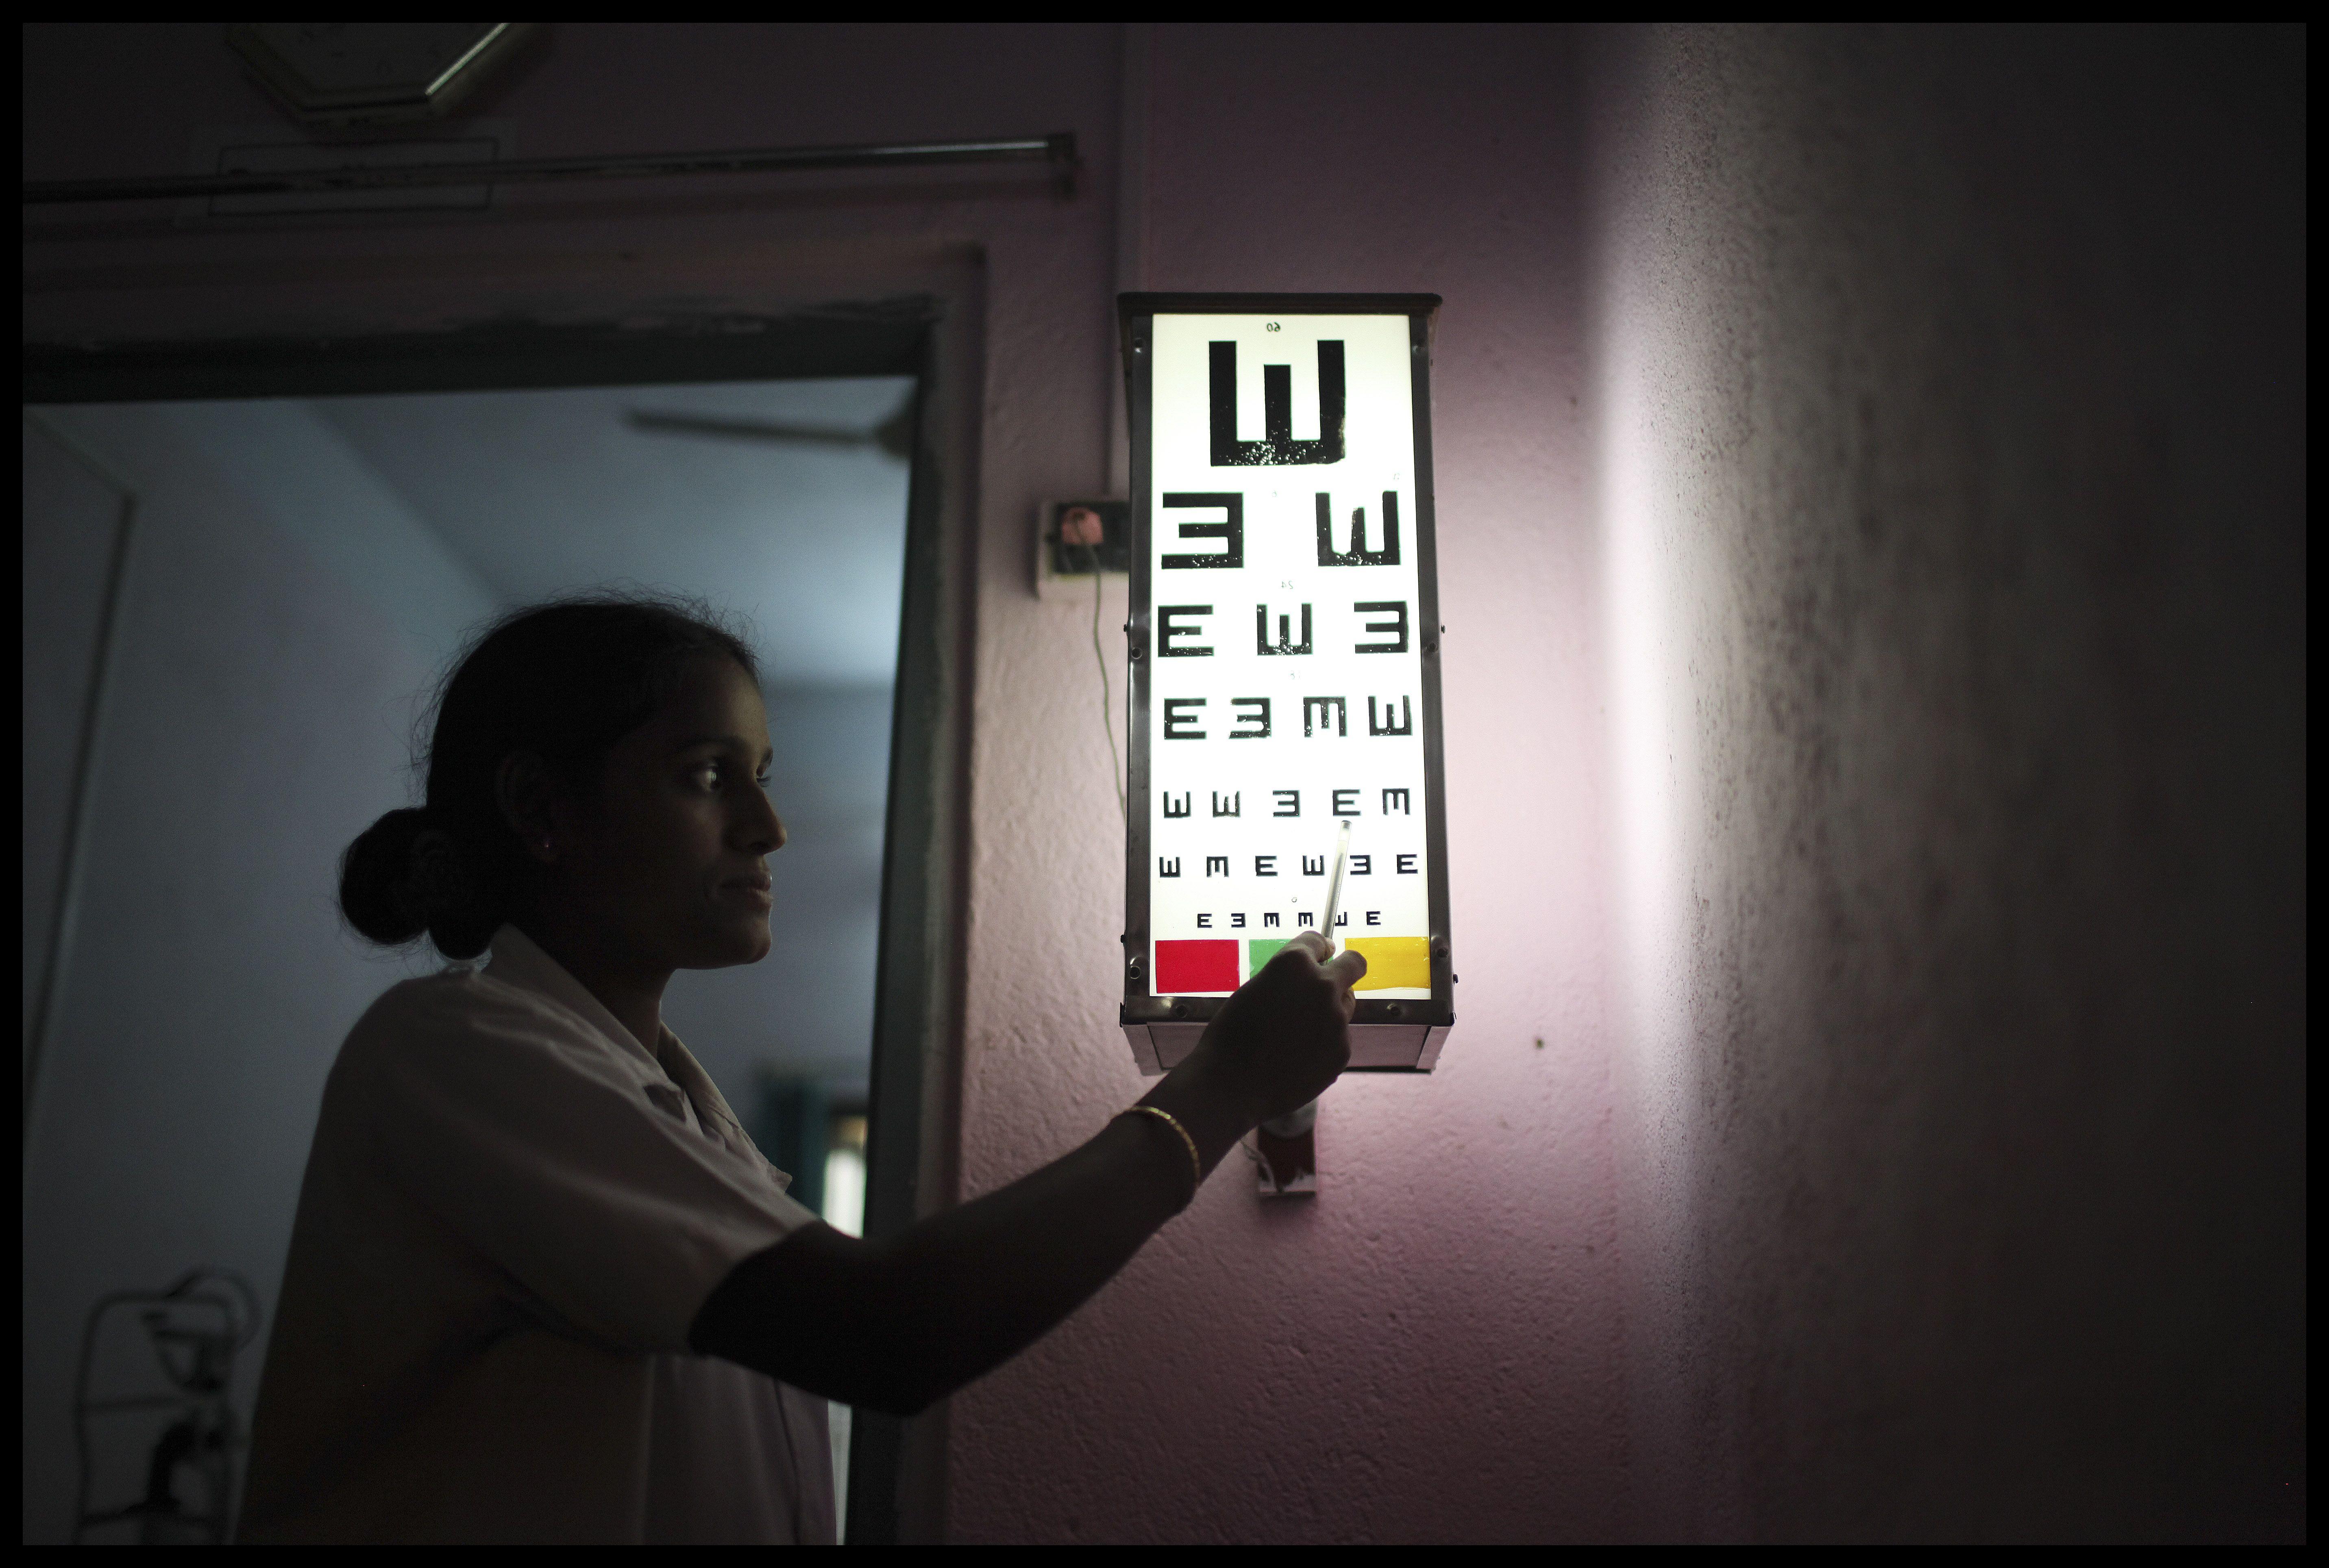 Regular eye exams reveal vision problems like